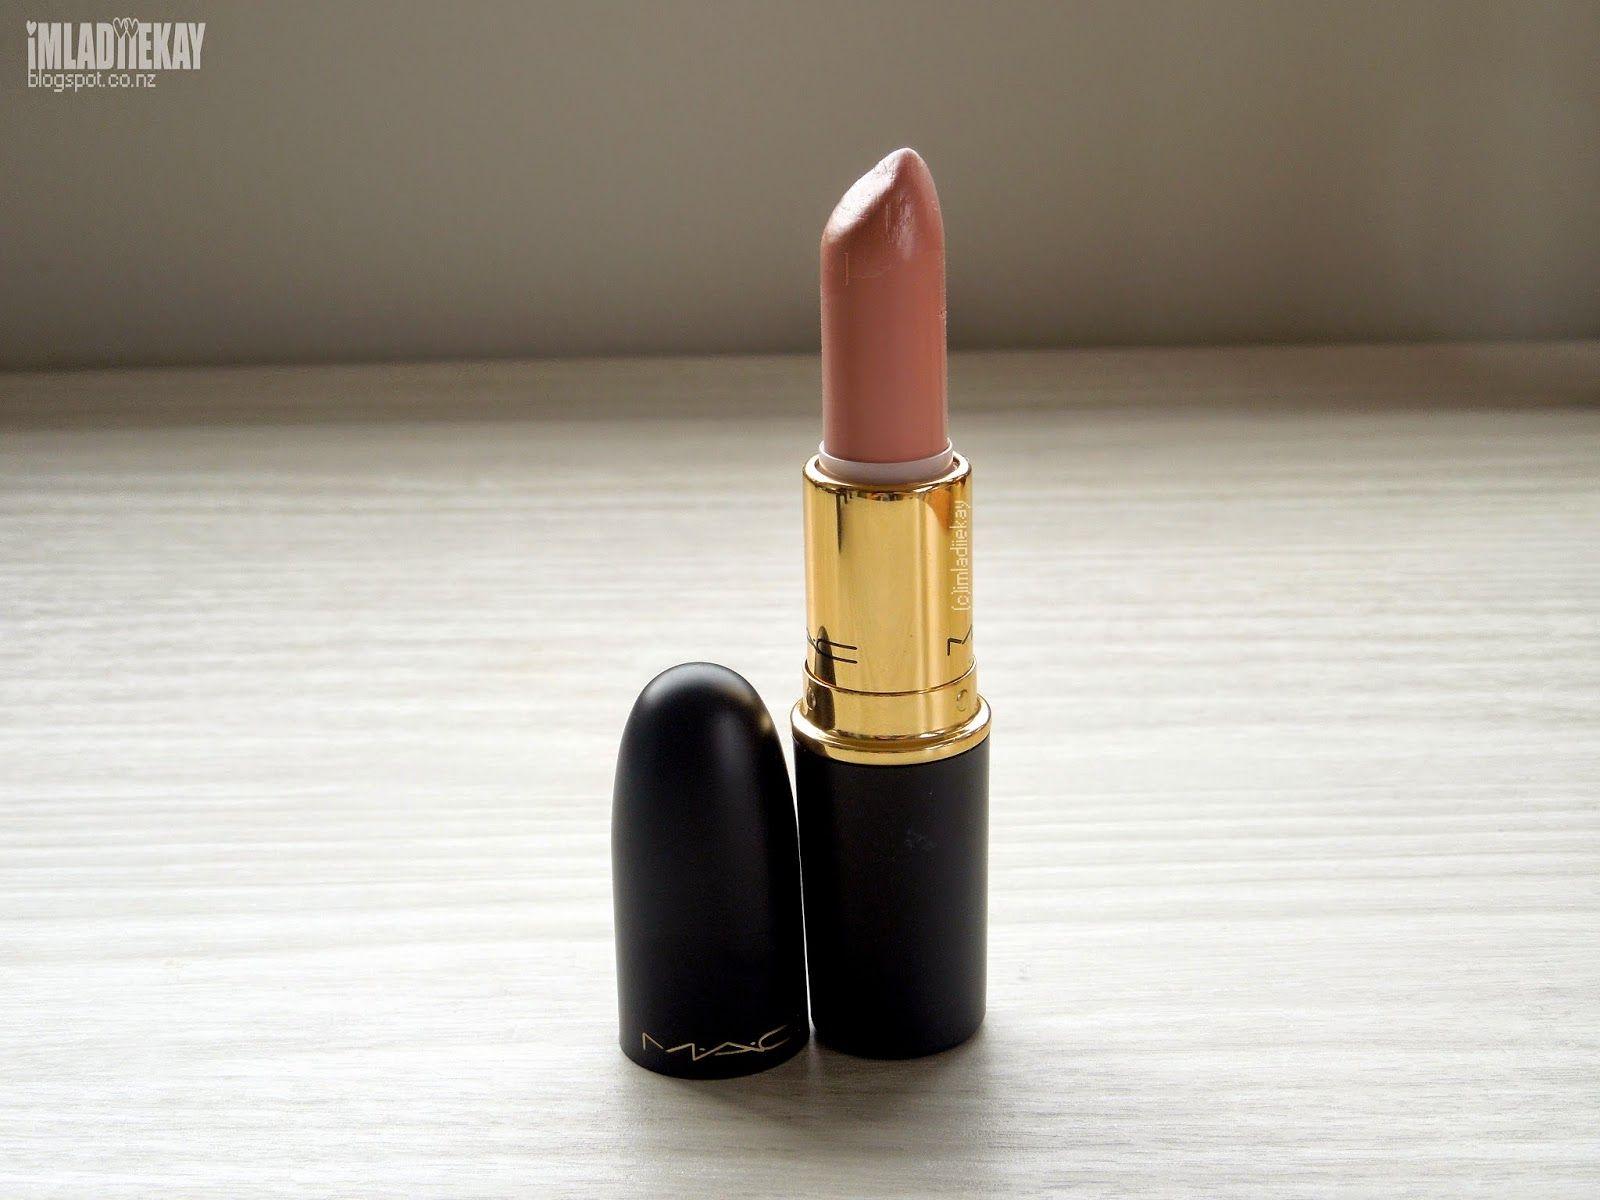 ♥ imladiiekay | Beauty and Lifestyle Blog: MAC Divine Night Collection ♡ Lipsticks Swatches #mac #makeup #lipsticks #swatches